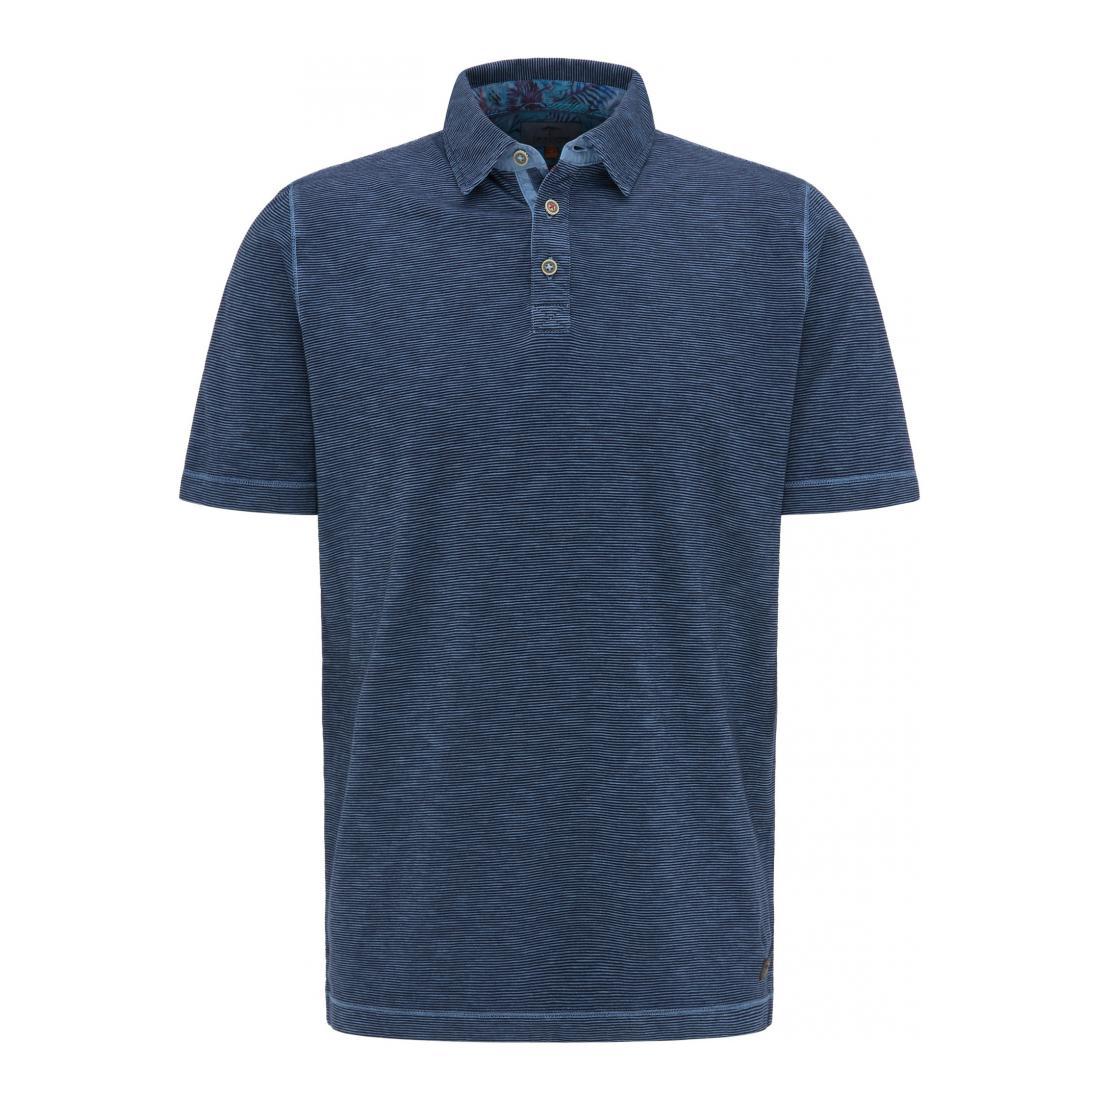 Fynch-Hatton Polo Herren Polo, Slub Jersey, Finest